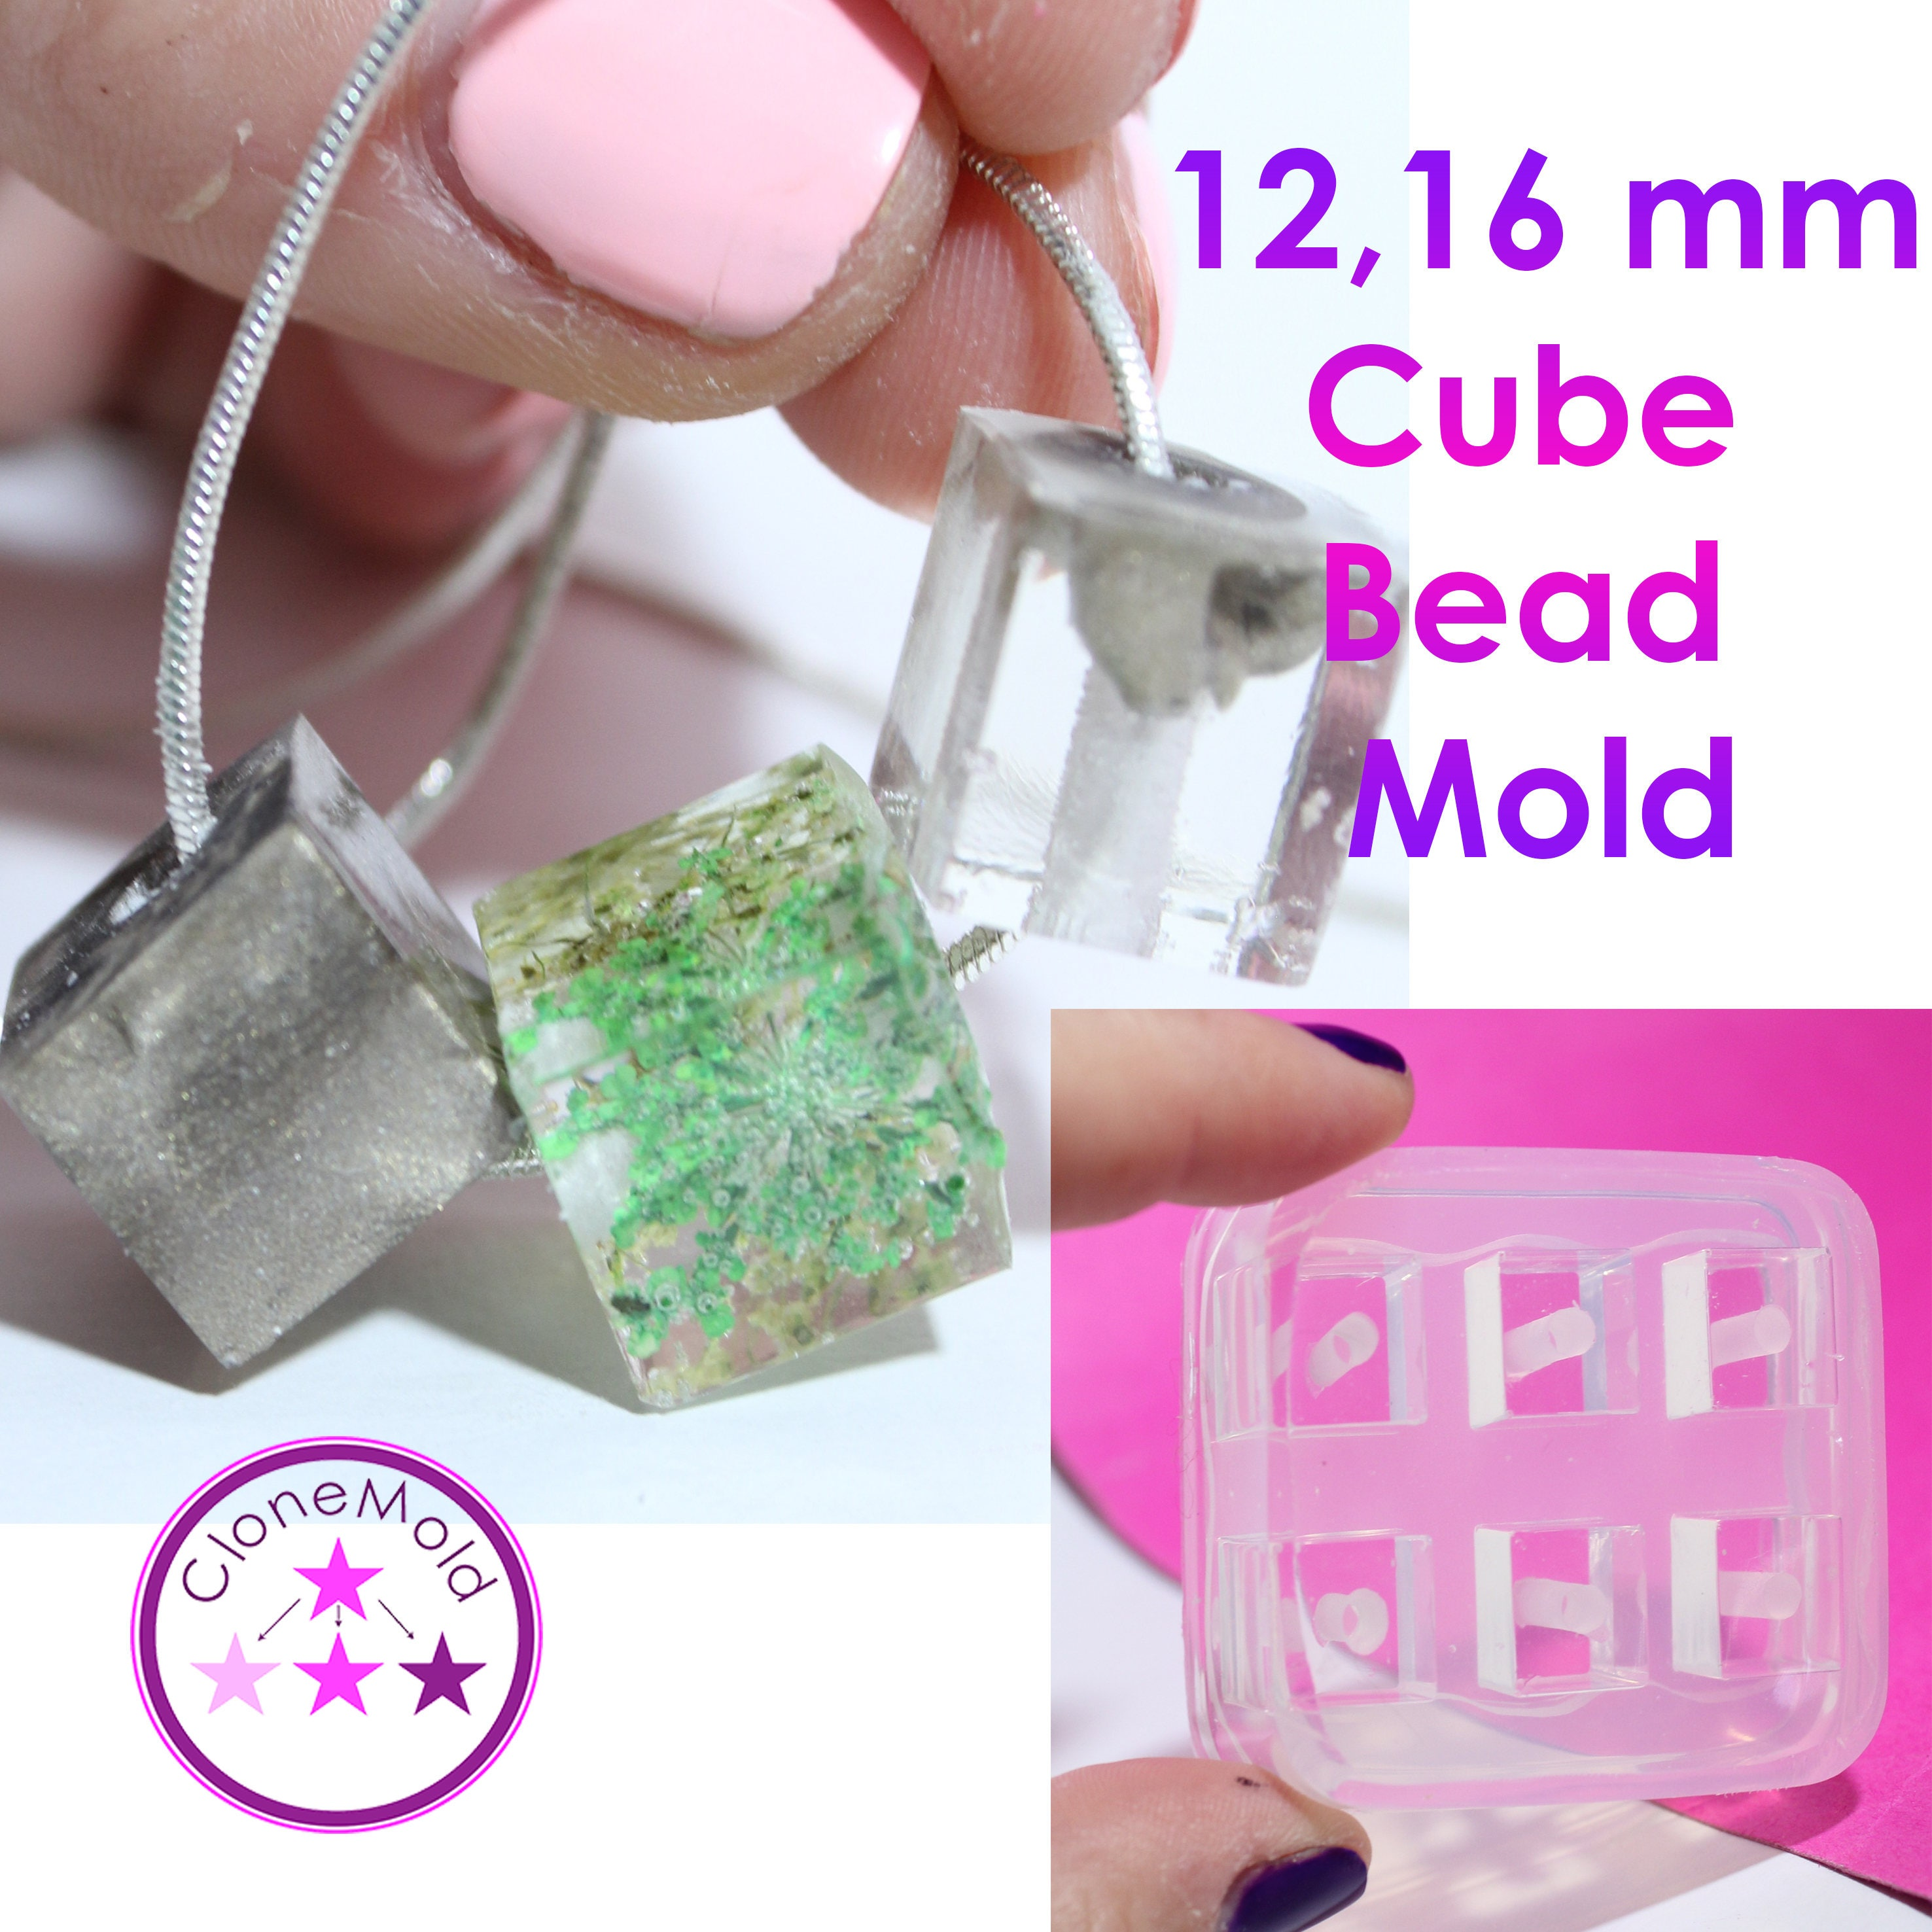 Cube Bead Mold Square Silicone Silicone Silicone Rubber; 6 Pieces; 12 or 16 mm 5bae33